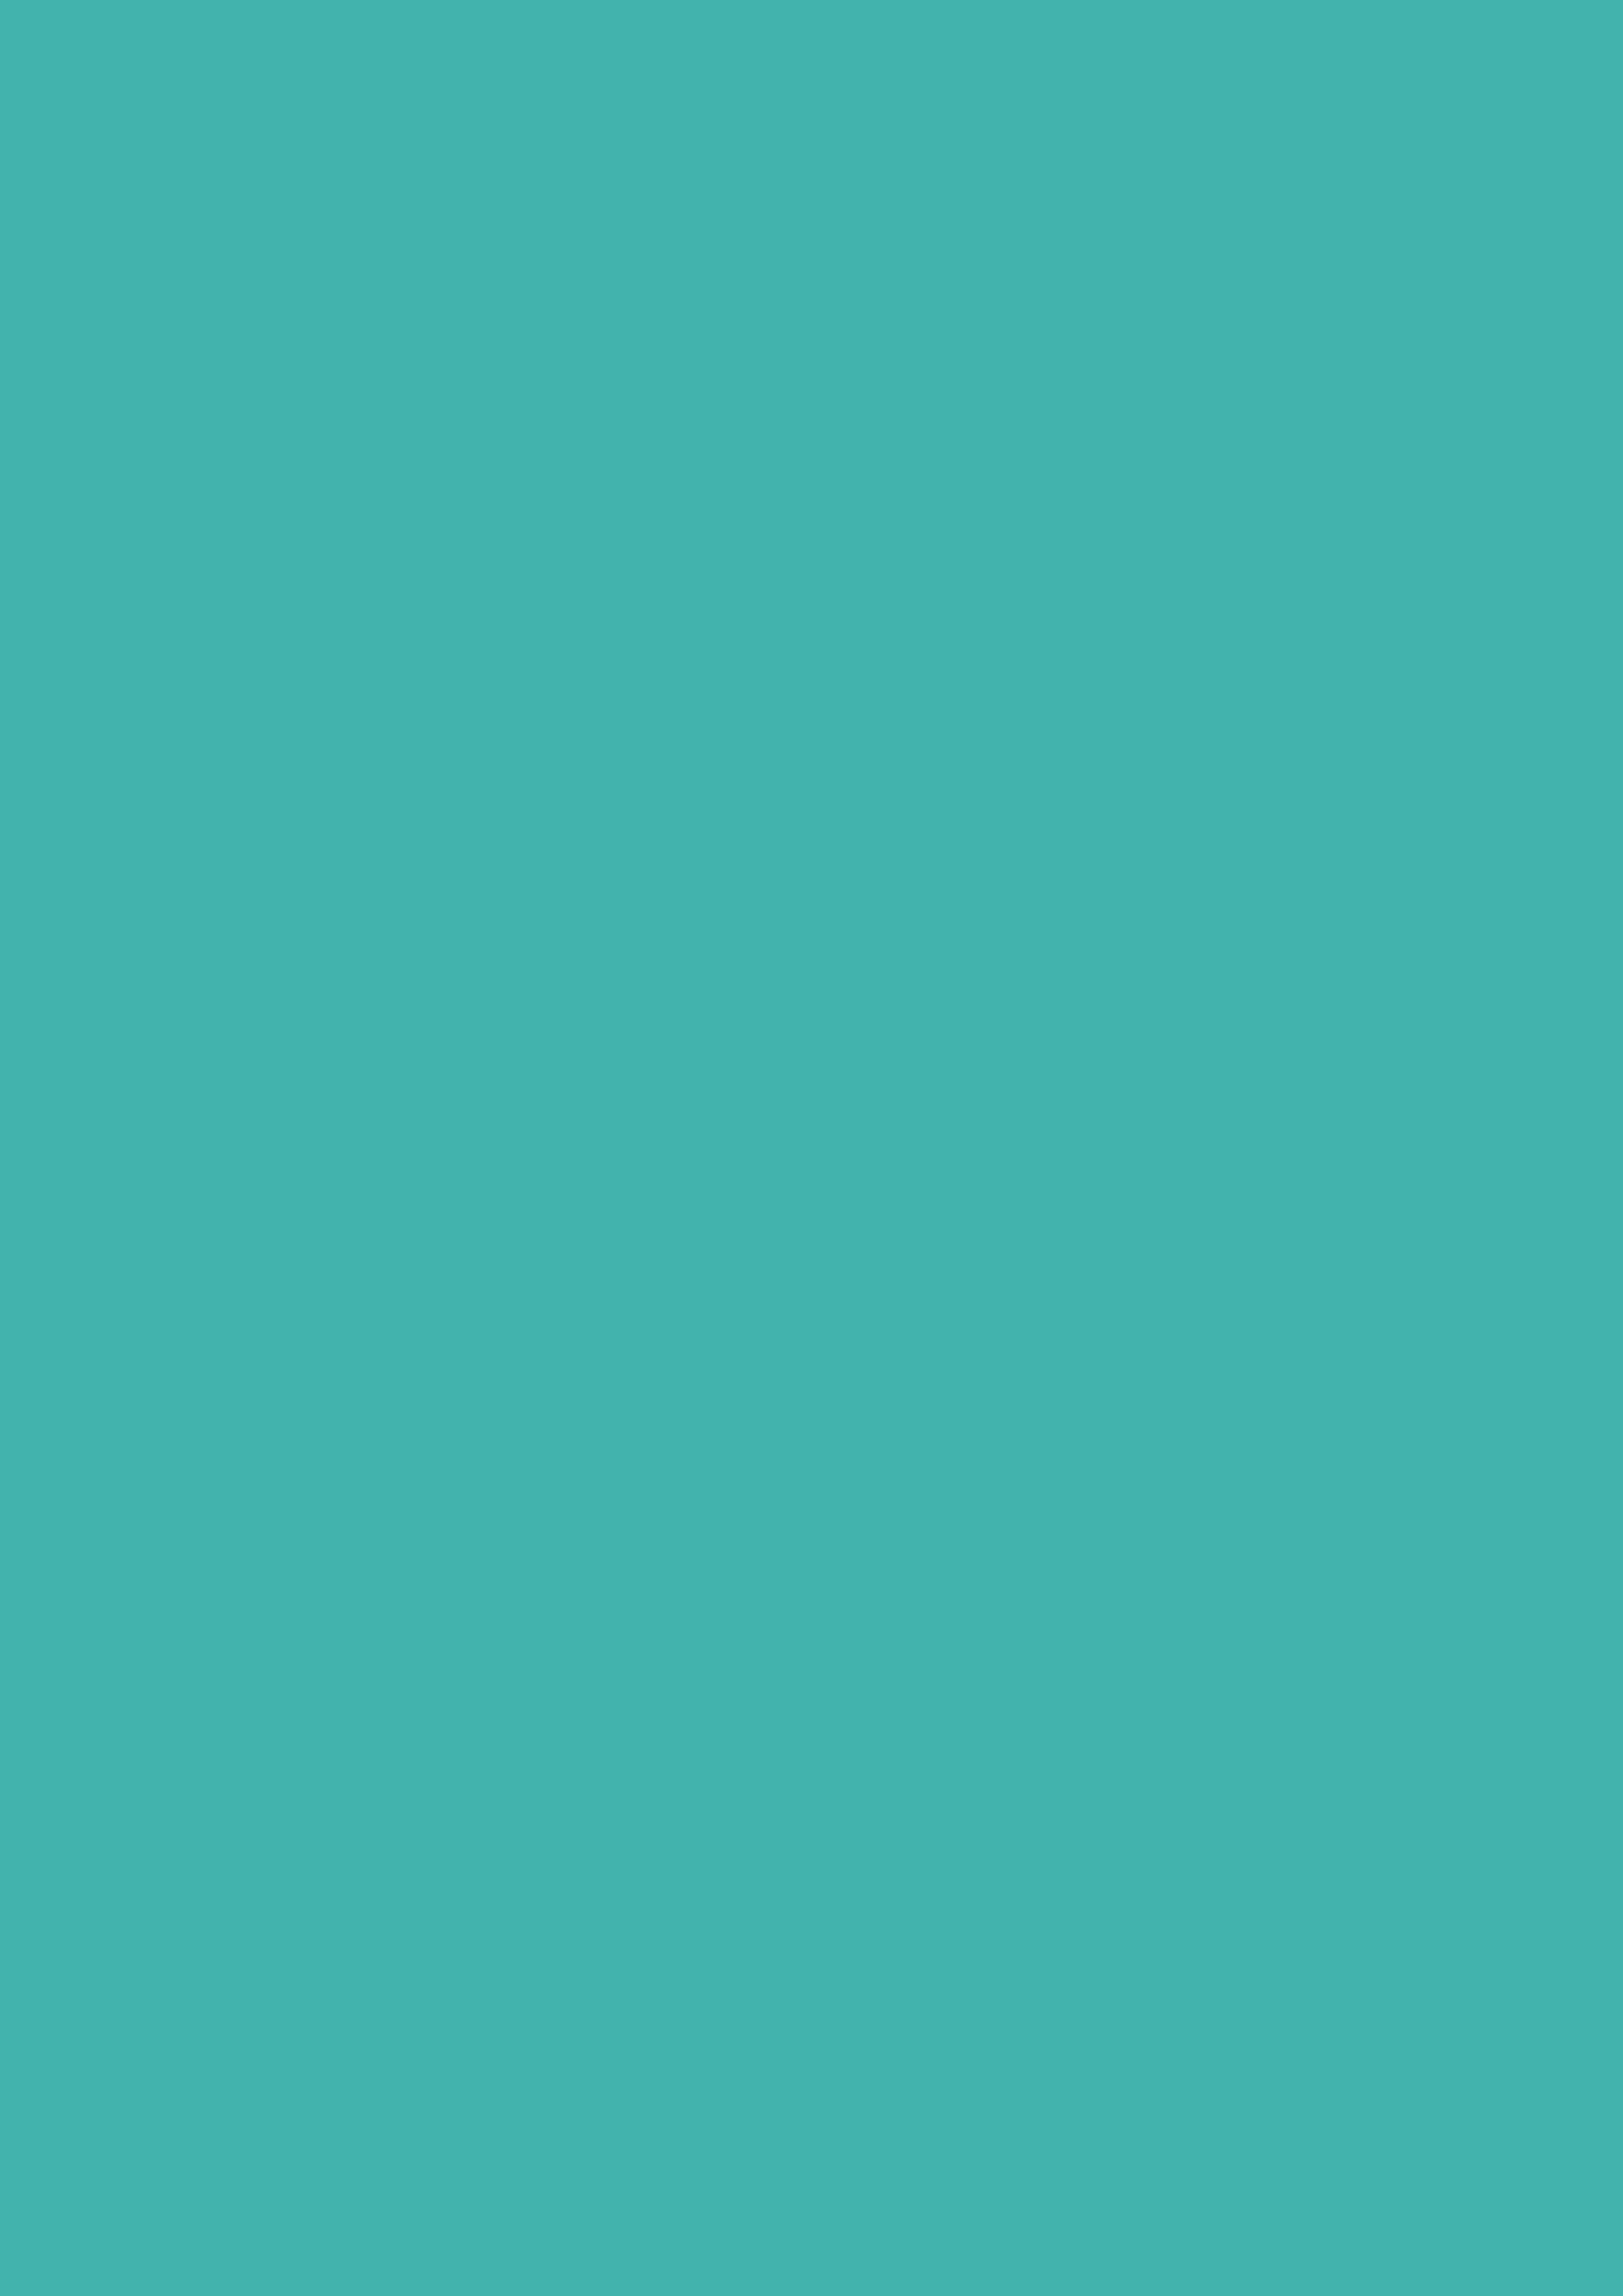 2480x3508 Verdigris Solid Color Background